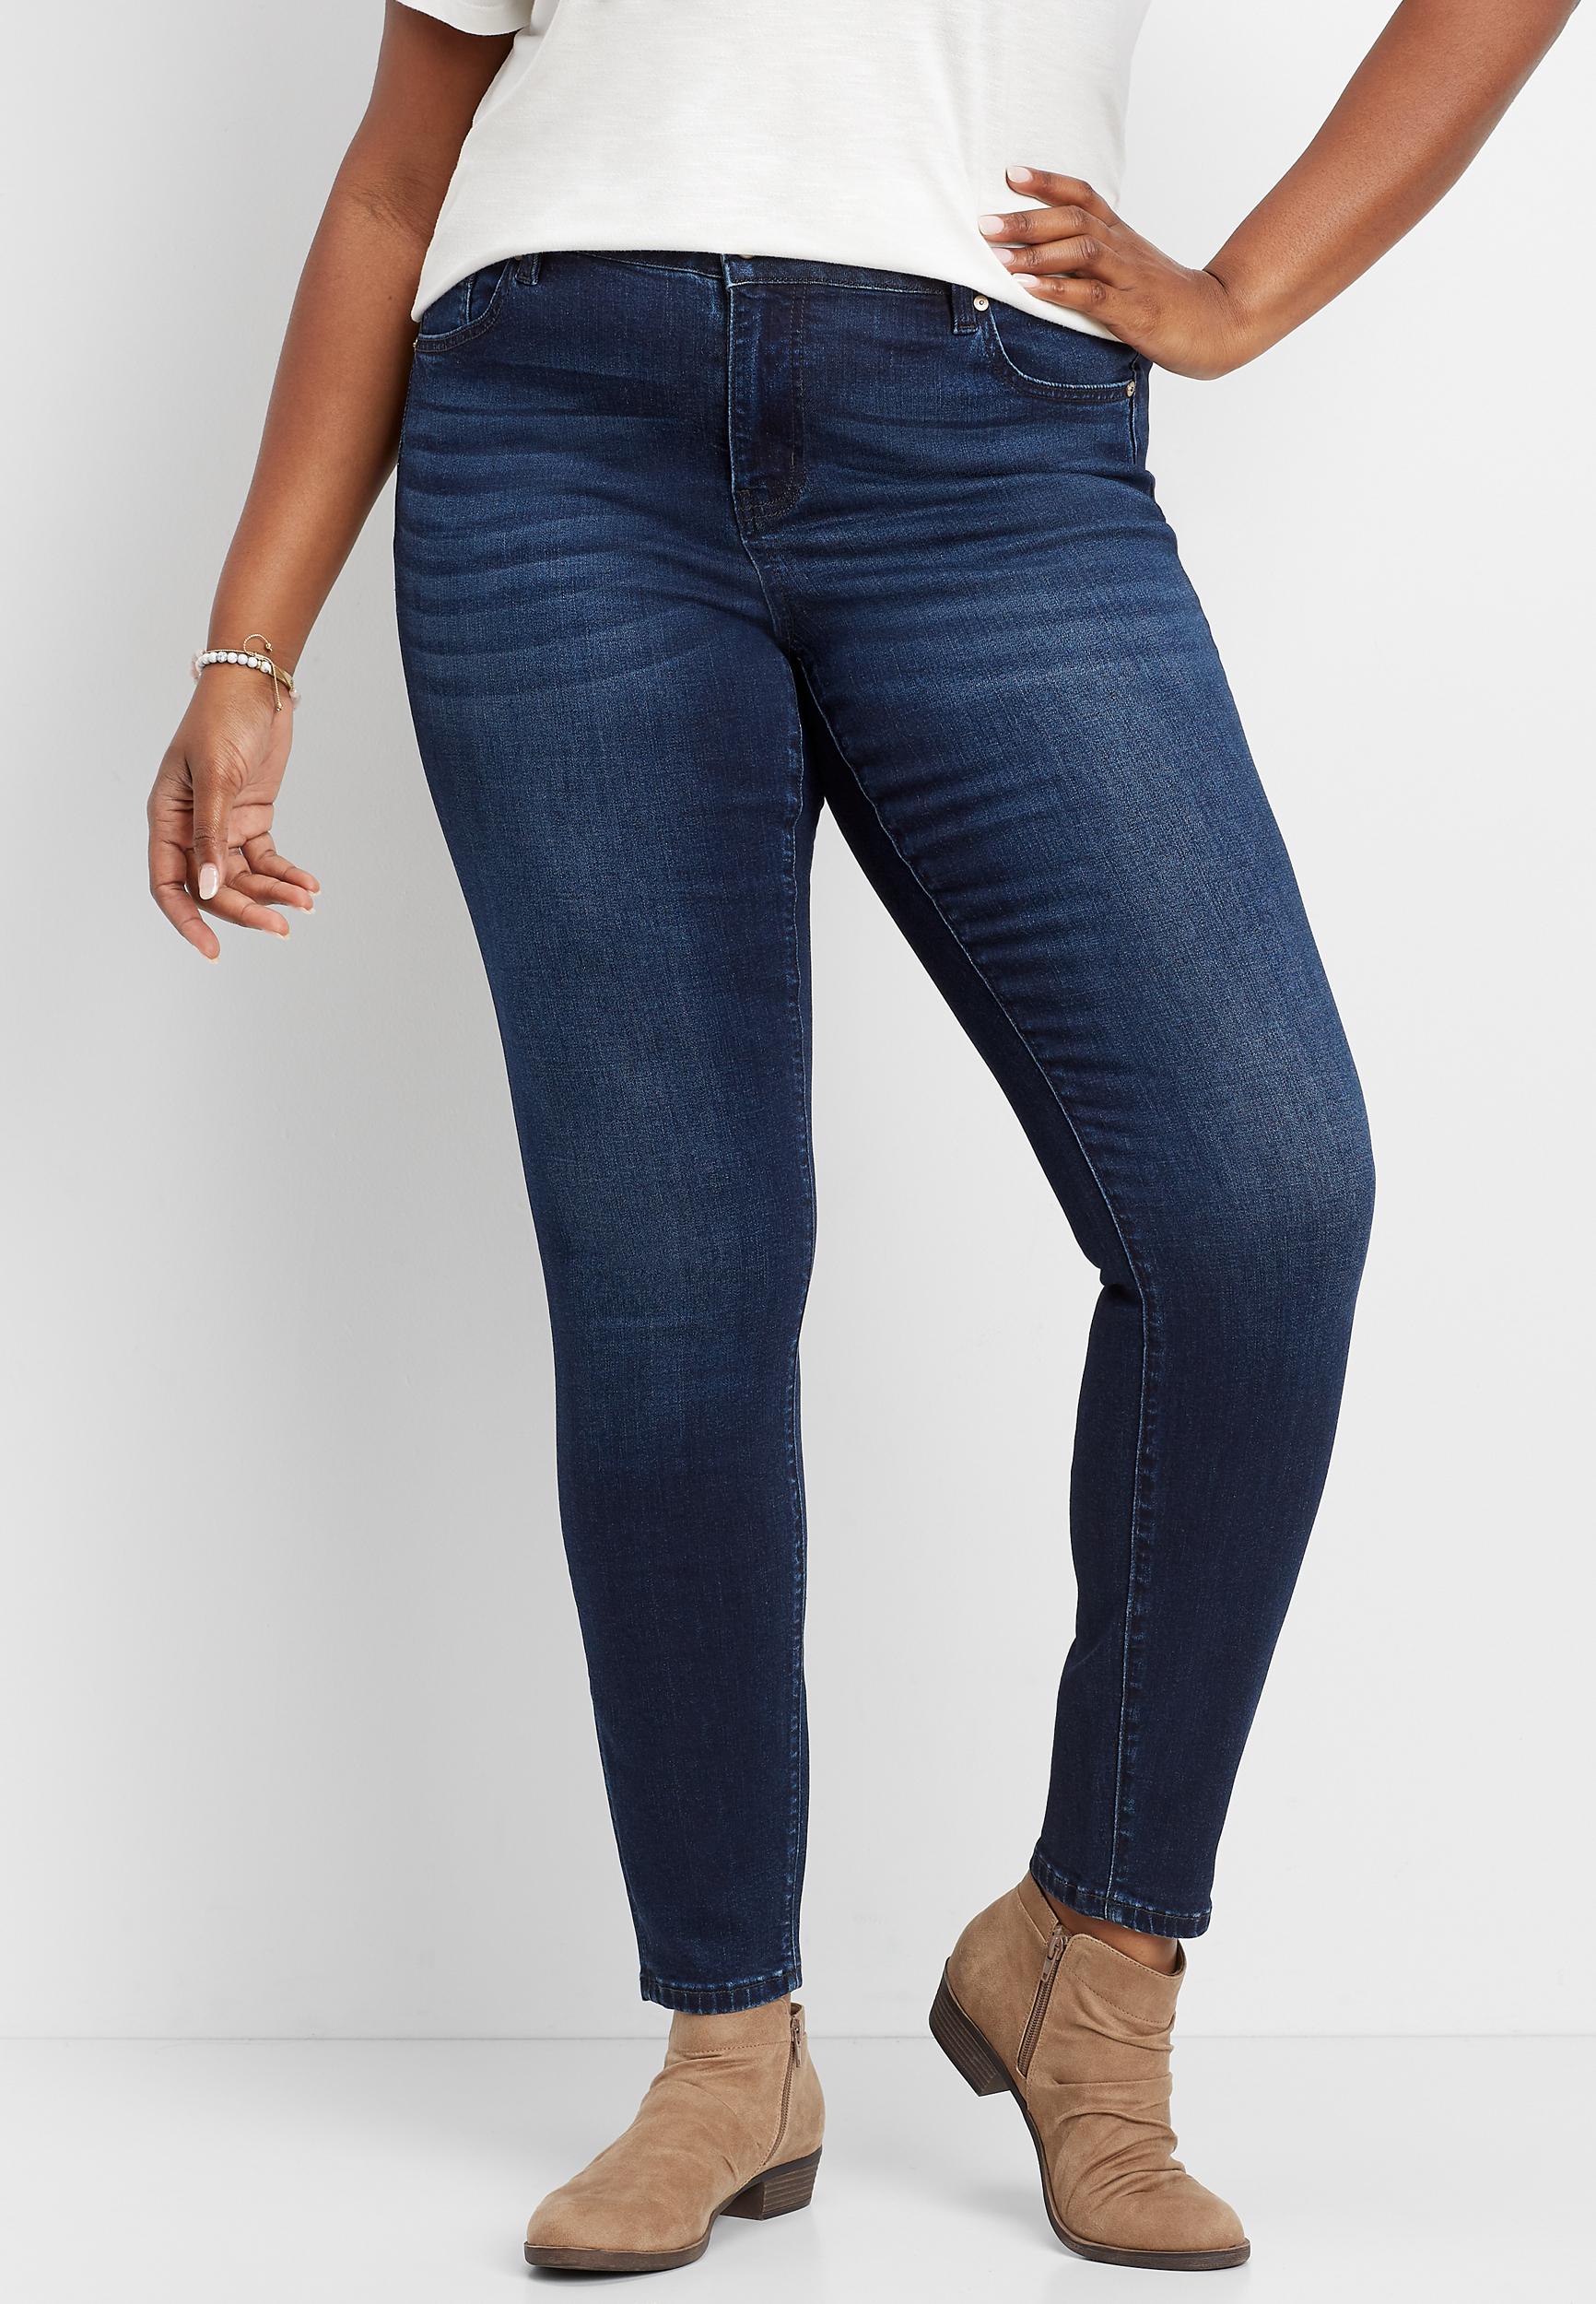 Plus Size Kancan Dark Wash Stretch Skinny Jean Maurices